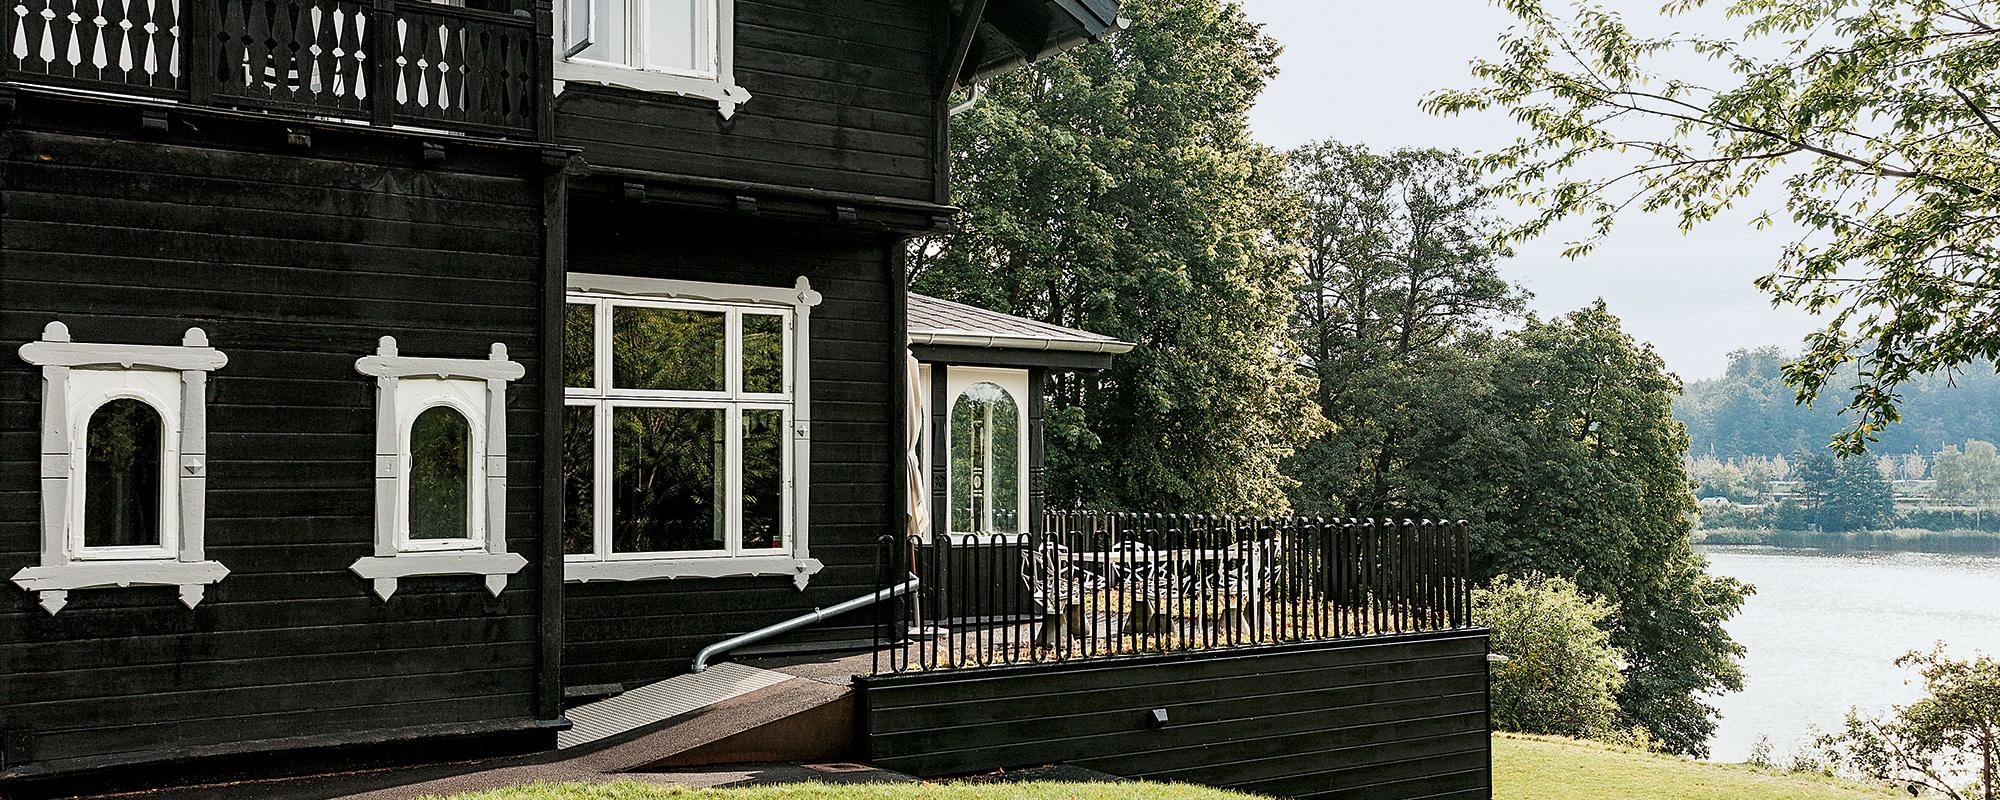 Haus, Holz, Schwarz, Seeland, Norwegen, Dänemark